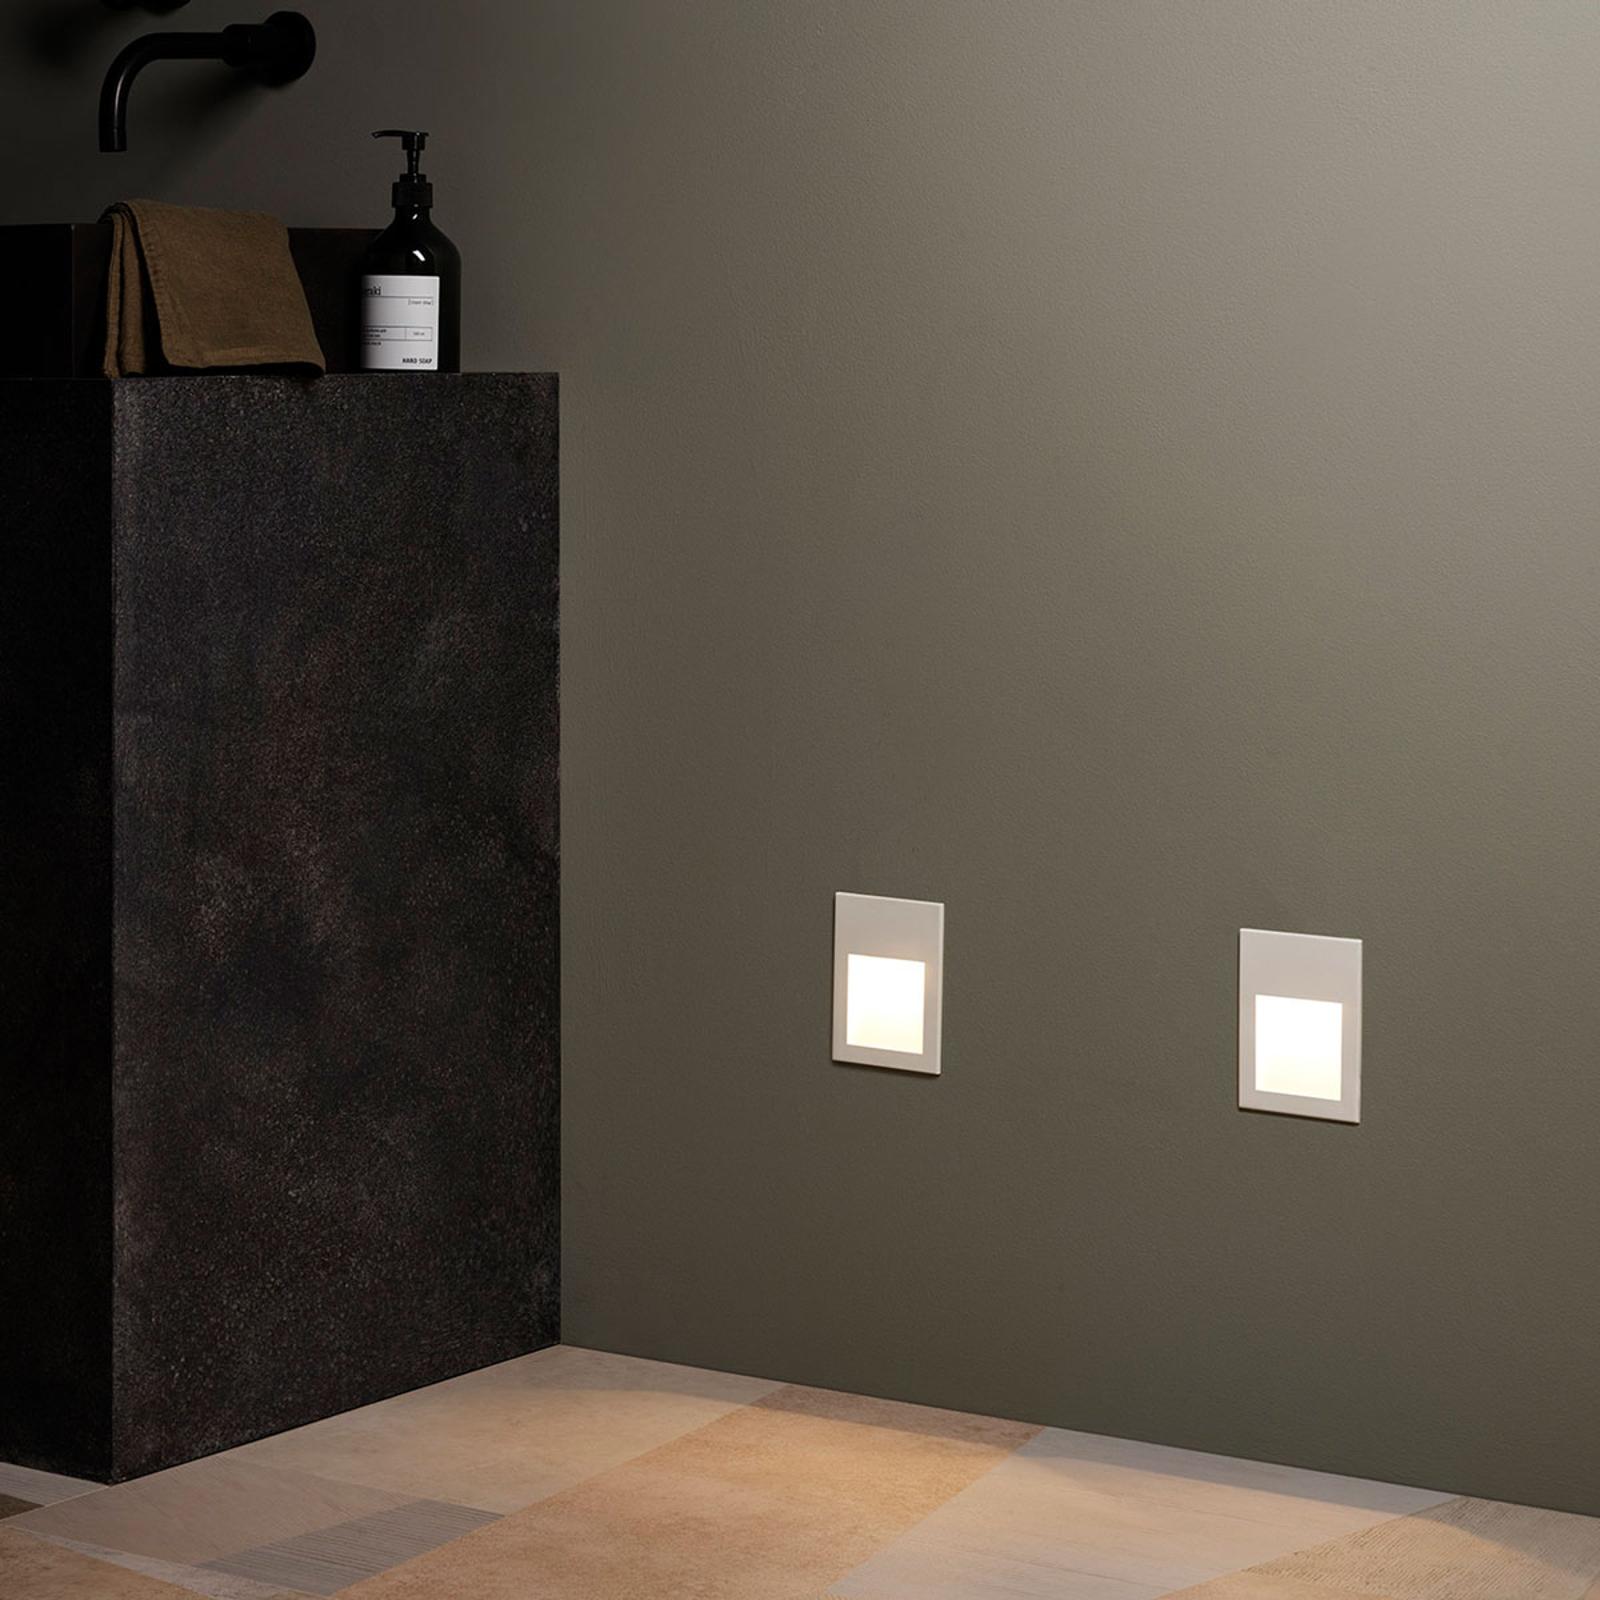 Astro Borgo 90 wand inbouwlamp wit textuur